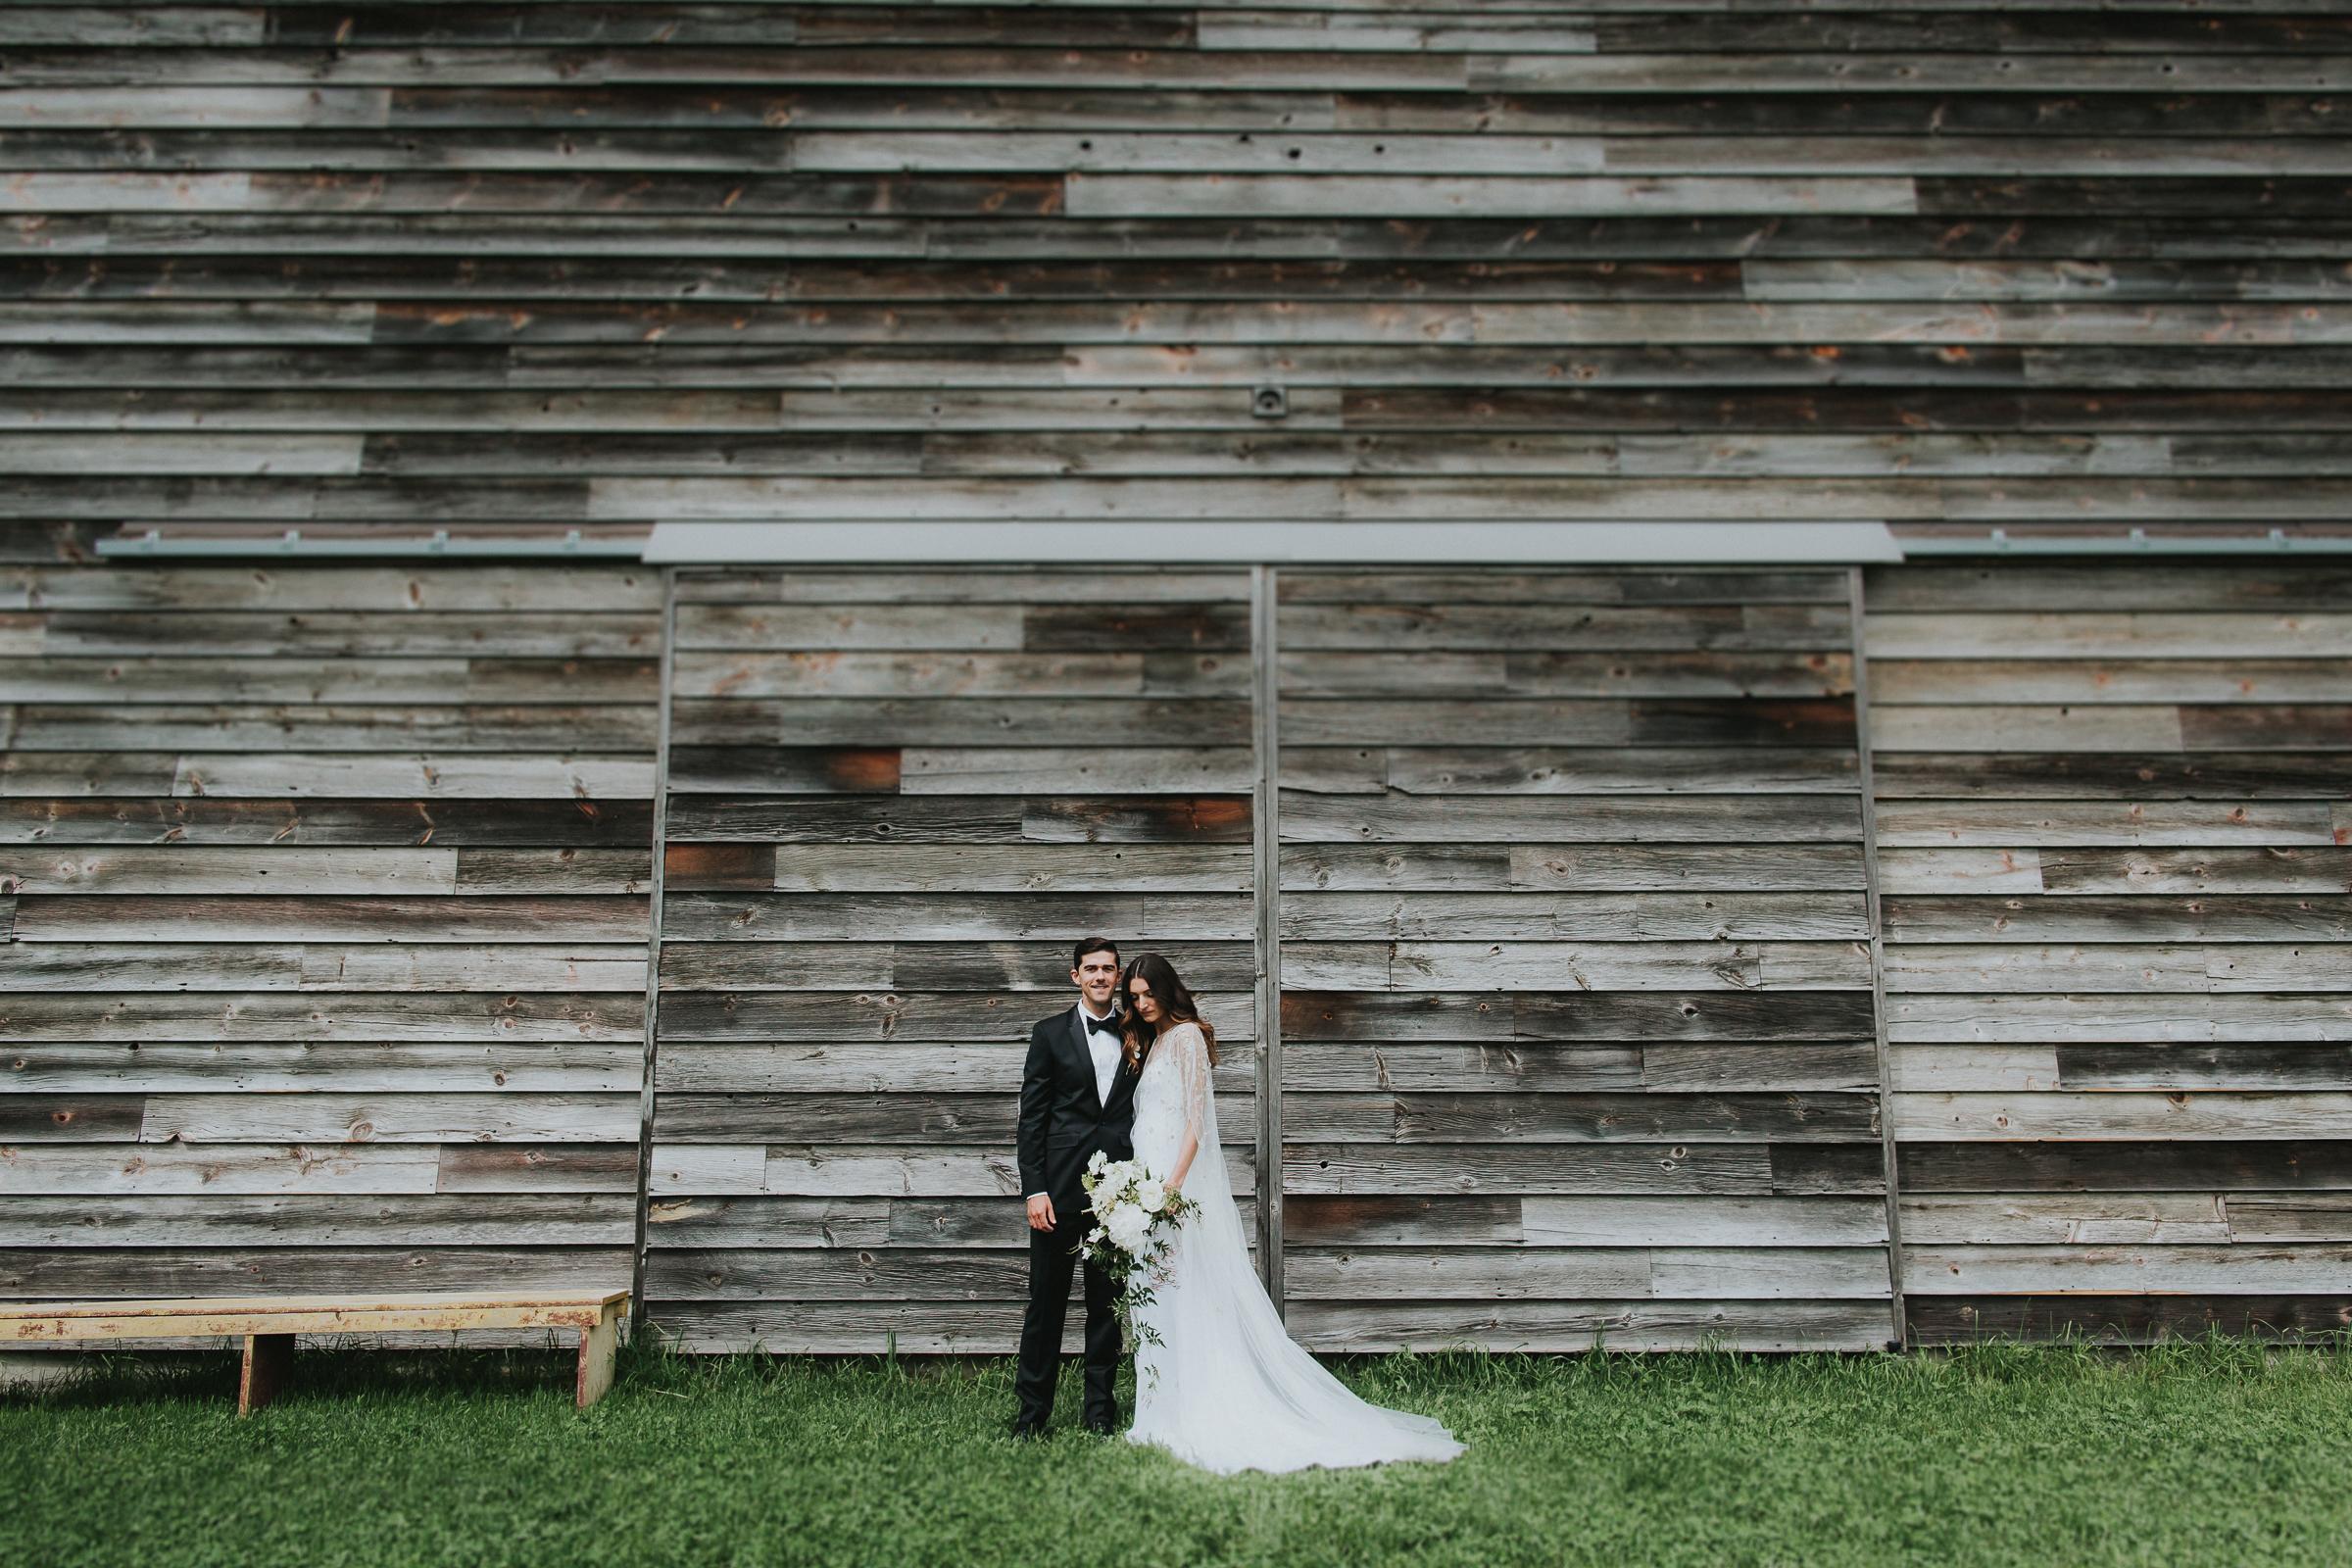 Handsome-Hollow-Long-Eddy-Catskills-New-York-Fine-Art-Documentary-Wedding-Photographer-41.jpg